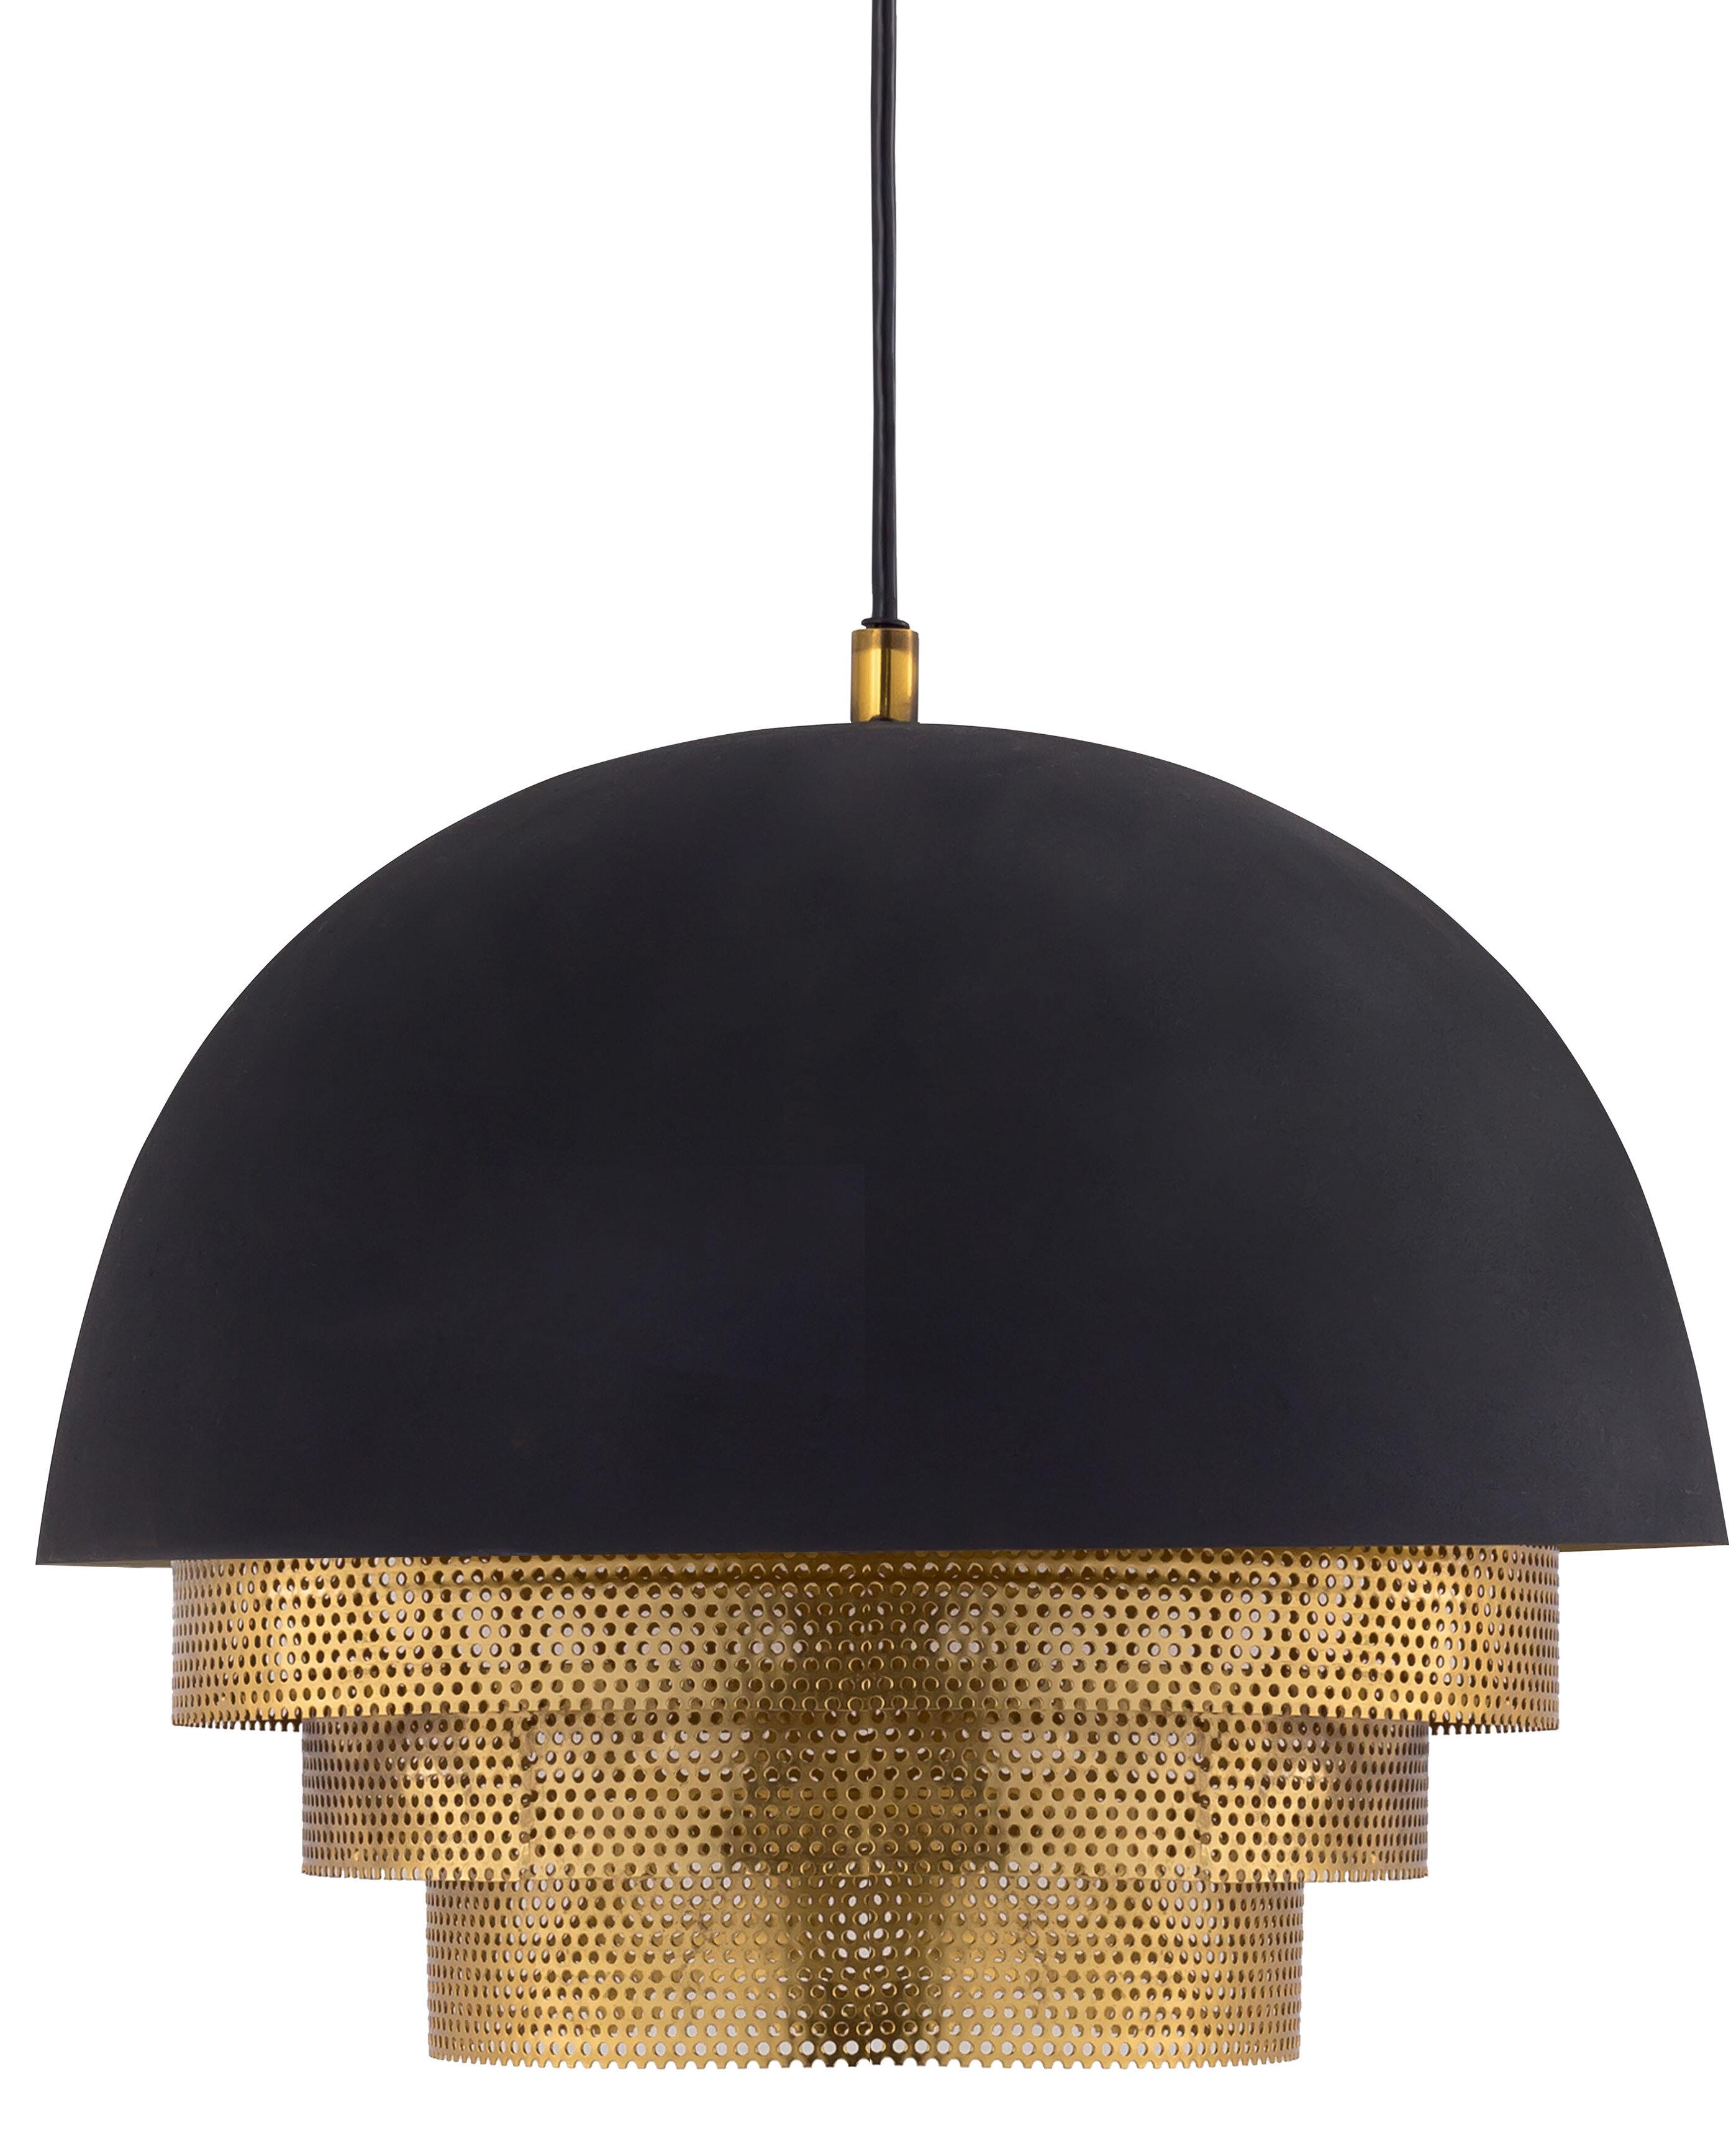 Corydon 1 Light Single Dome Pendant Reviews Allmodern